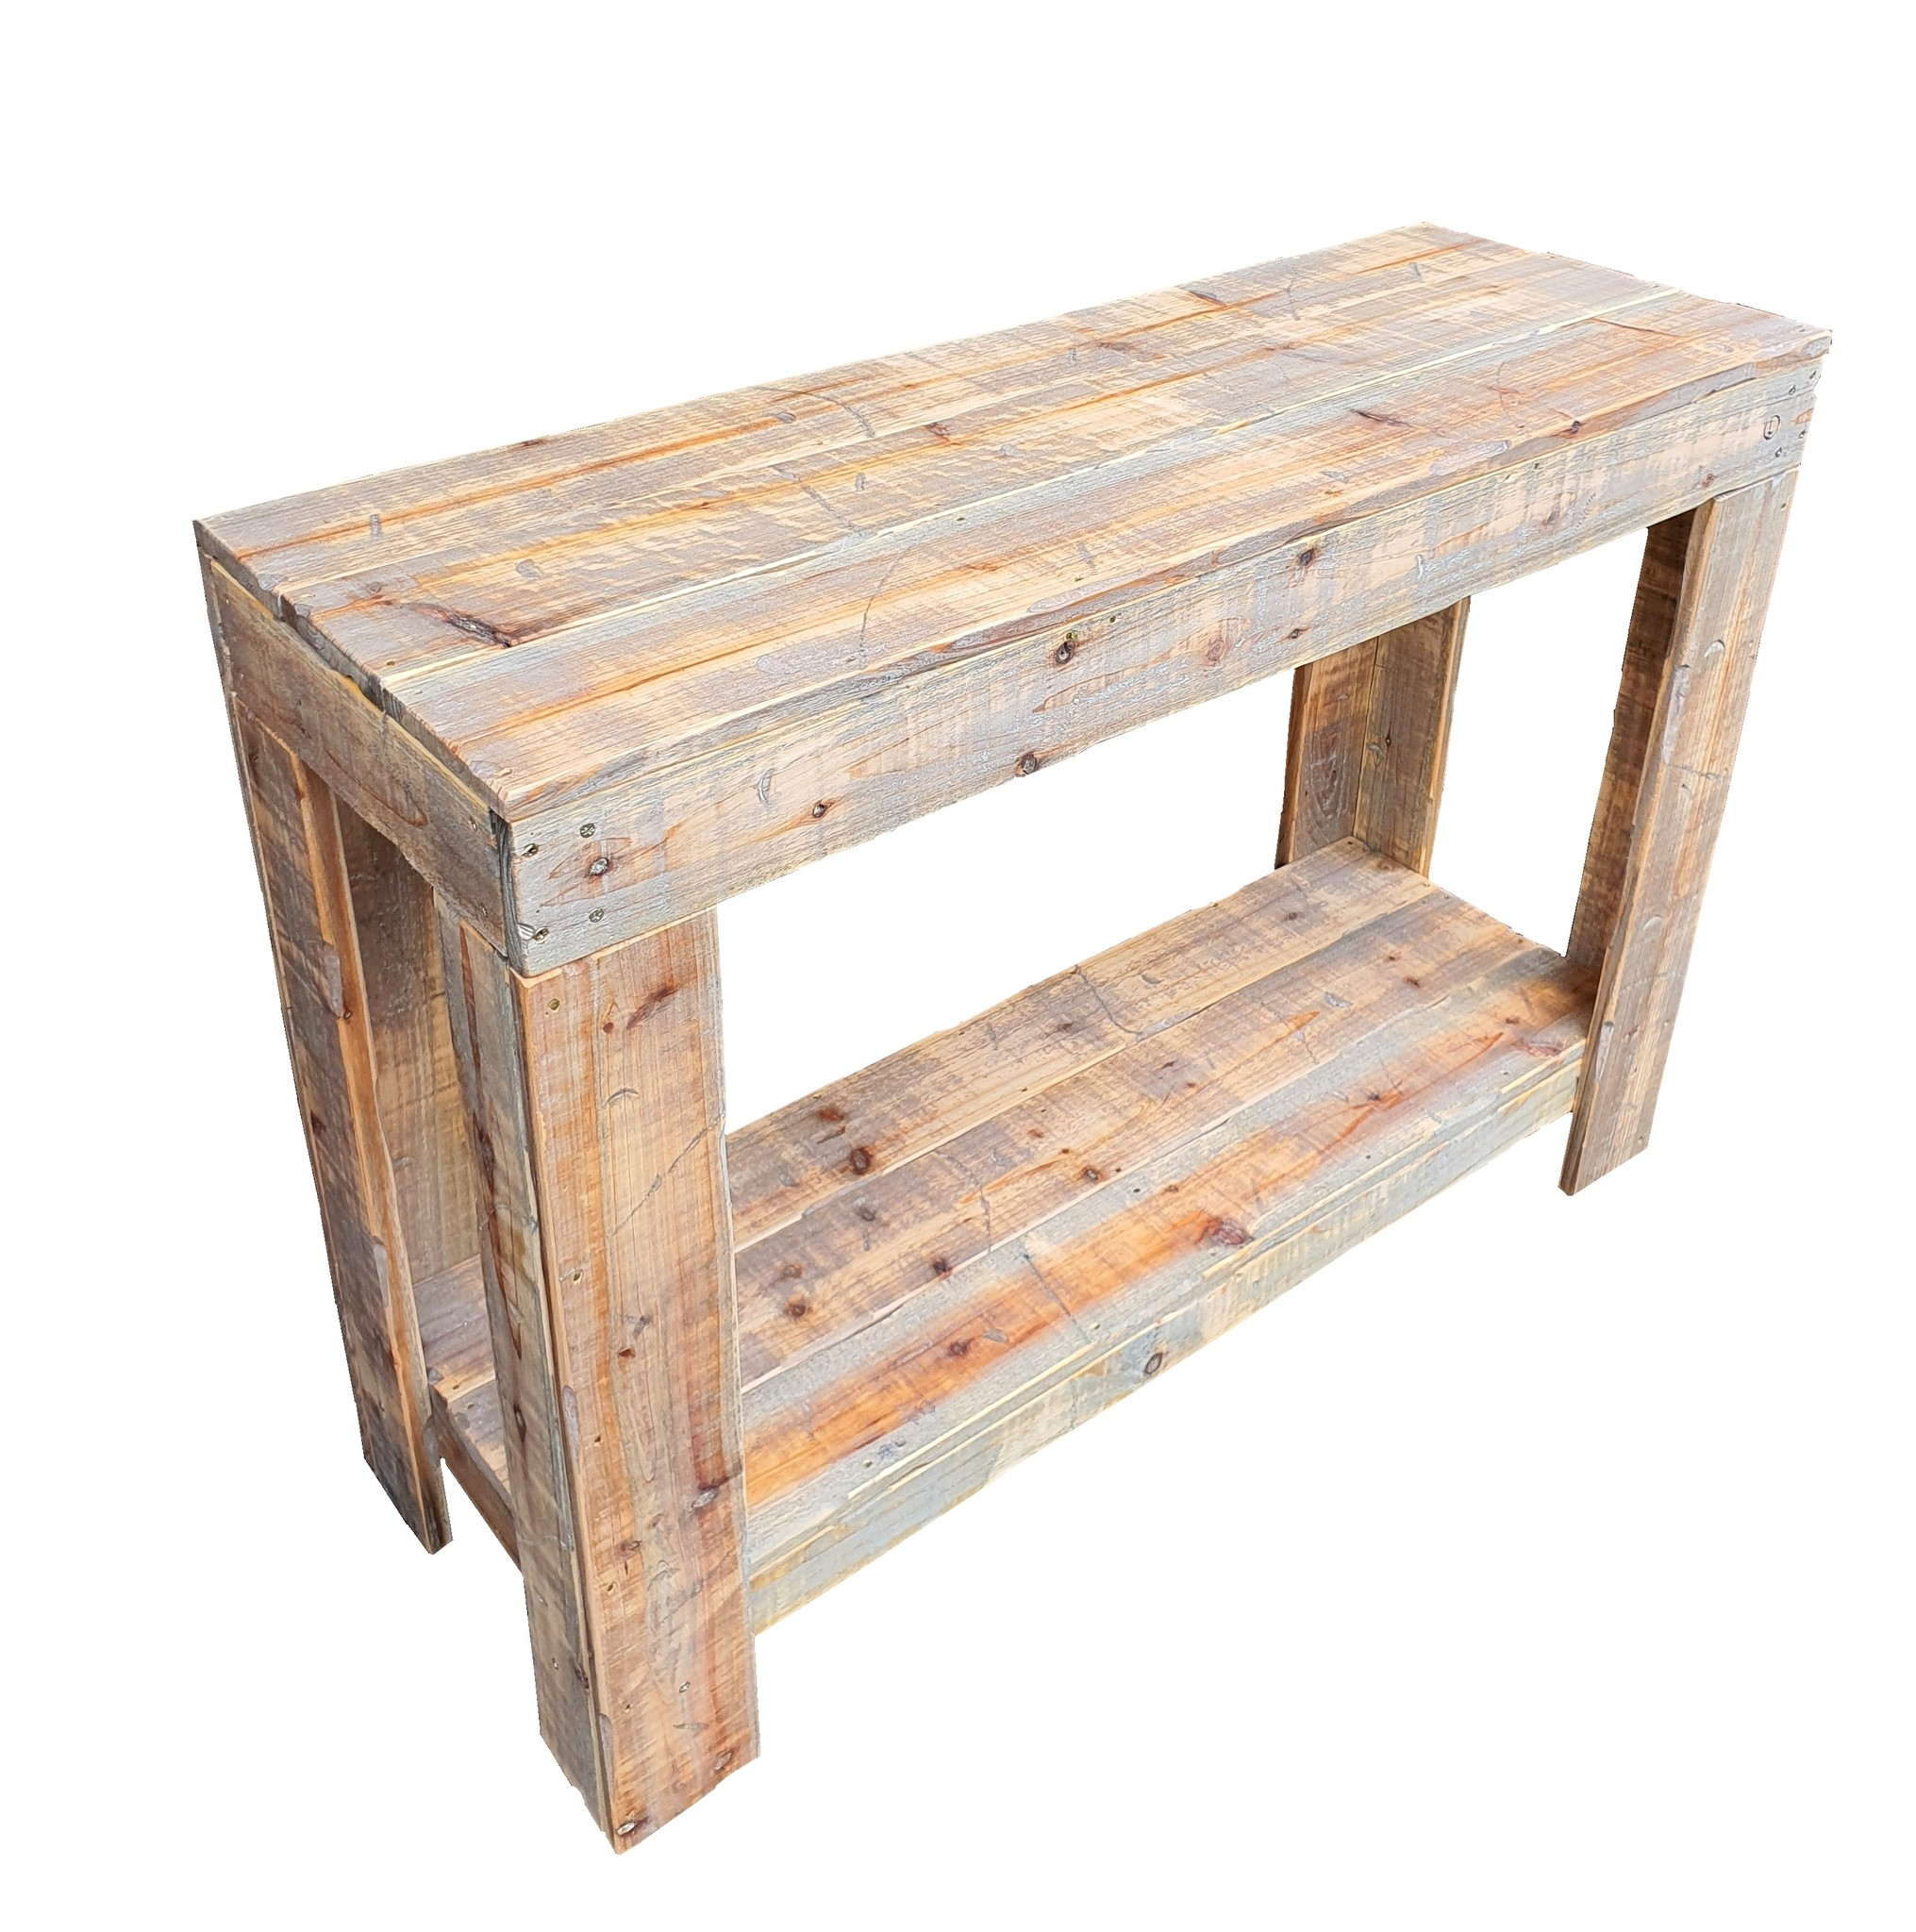 shop int dutch dark table double 110/39-3